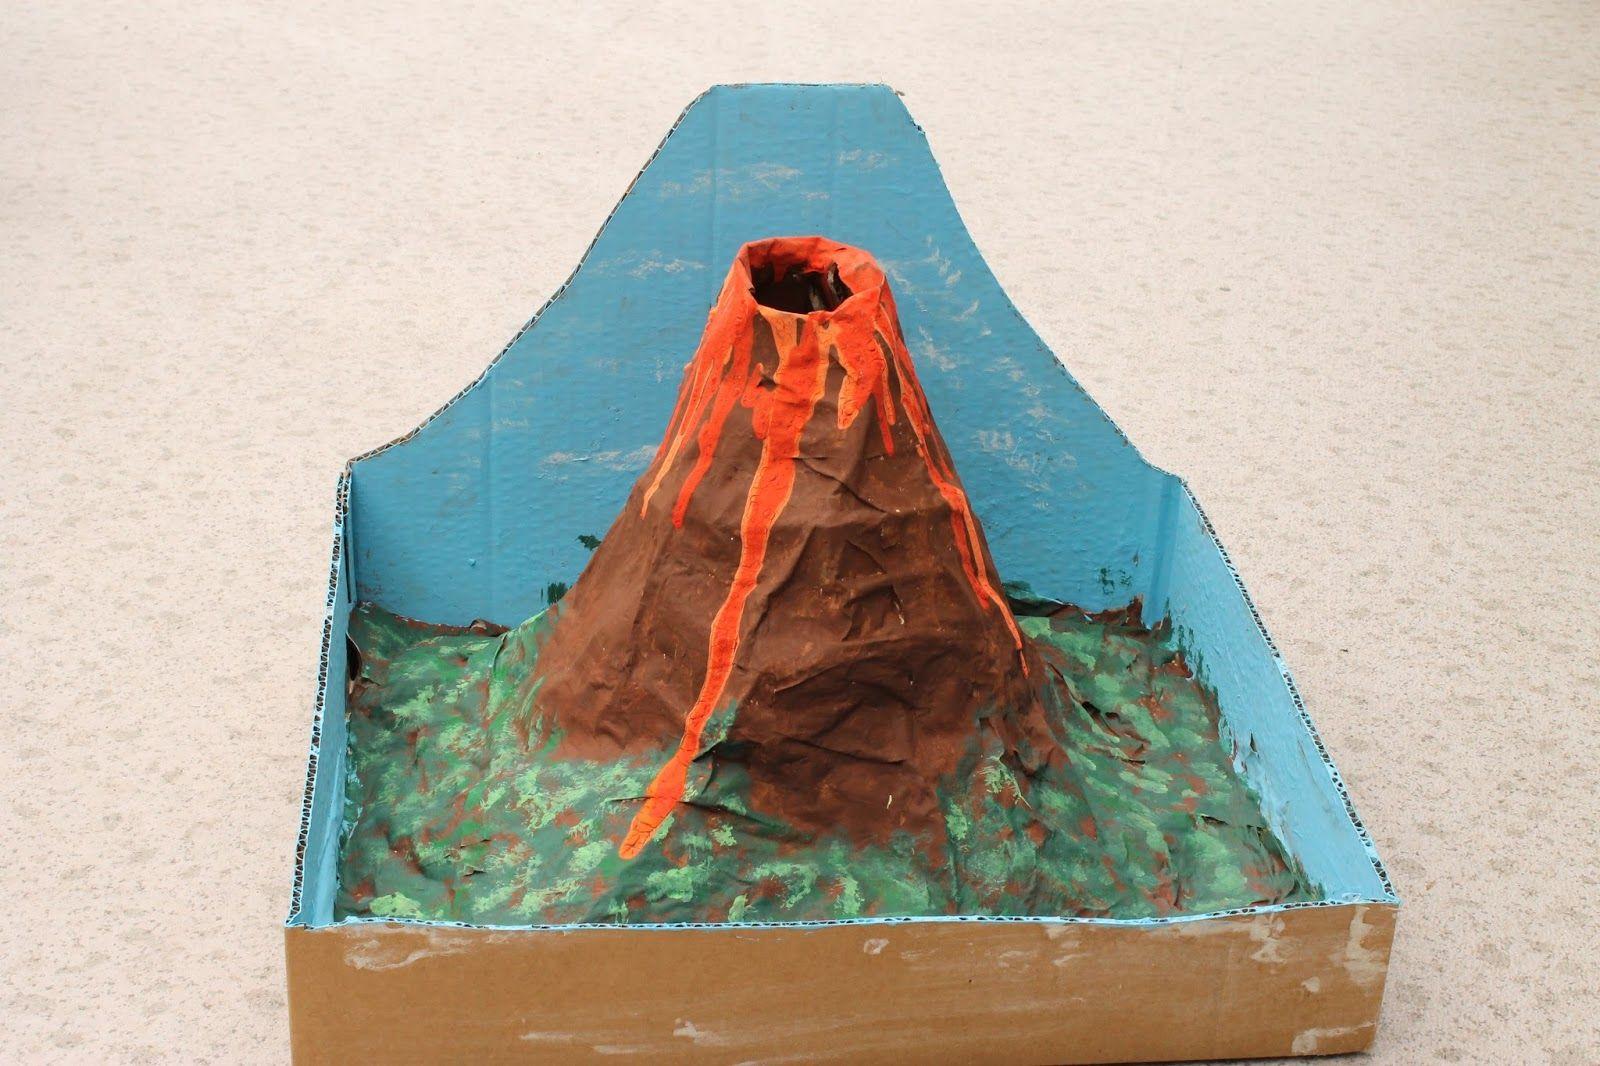 Essay on Volcanoes | Geology